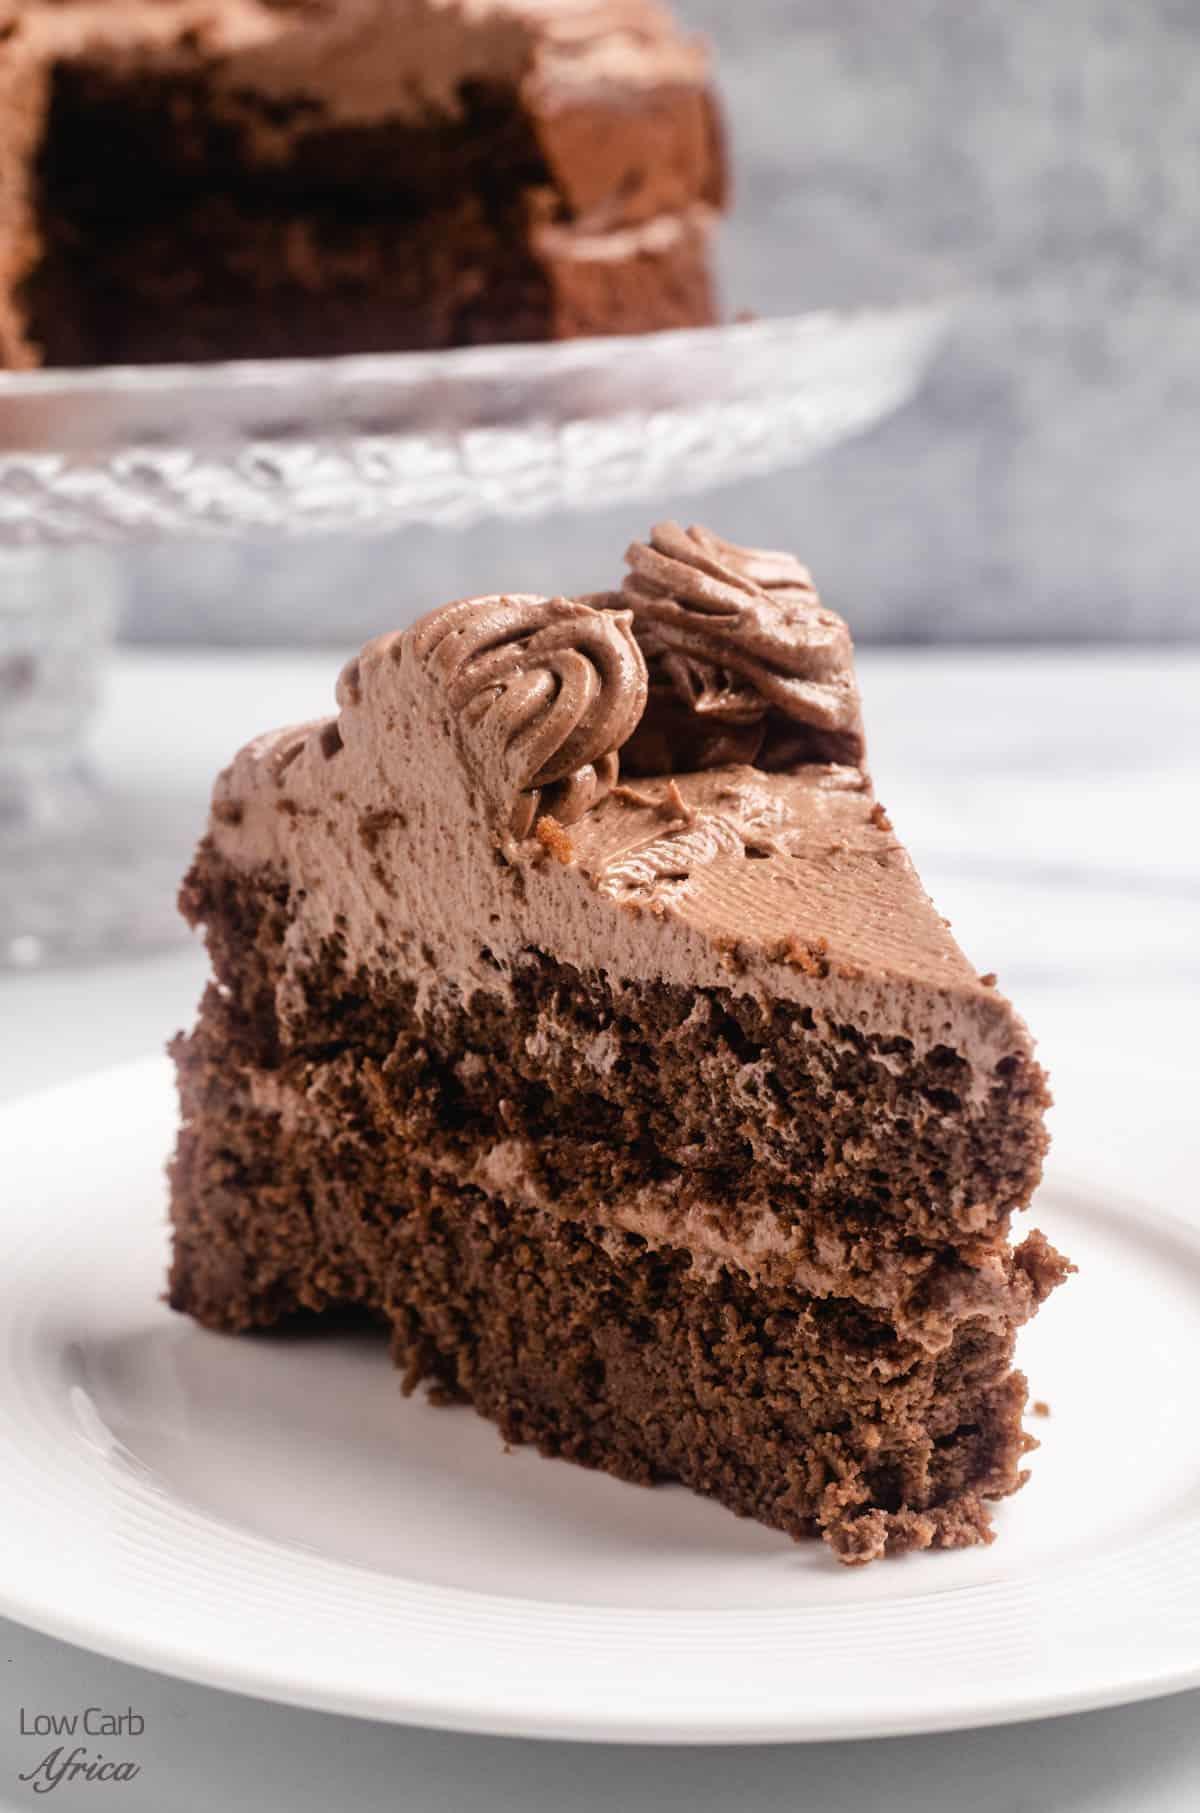 A slice of keto chocolate cake